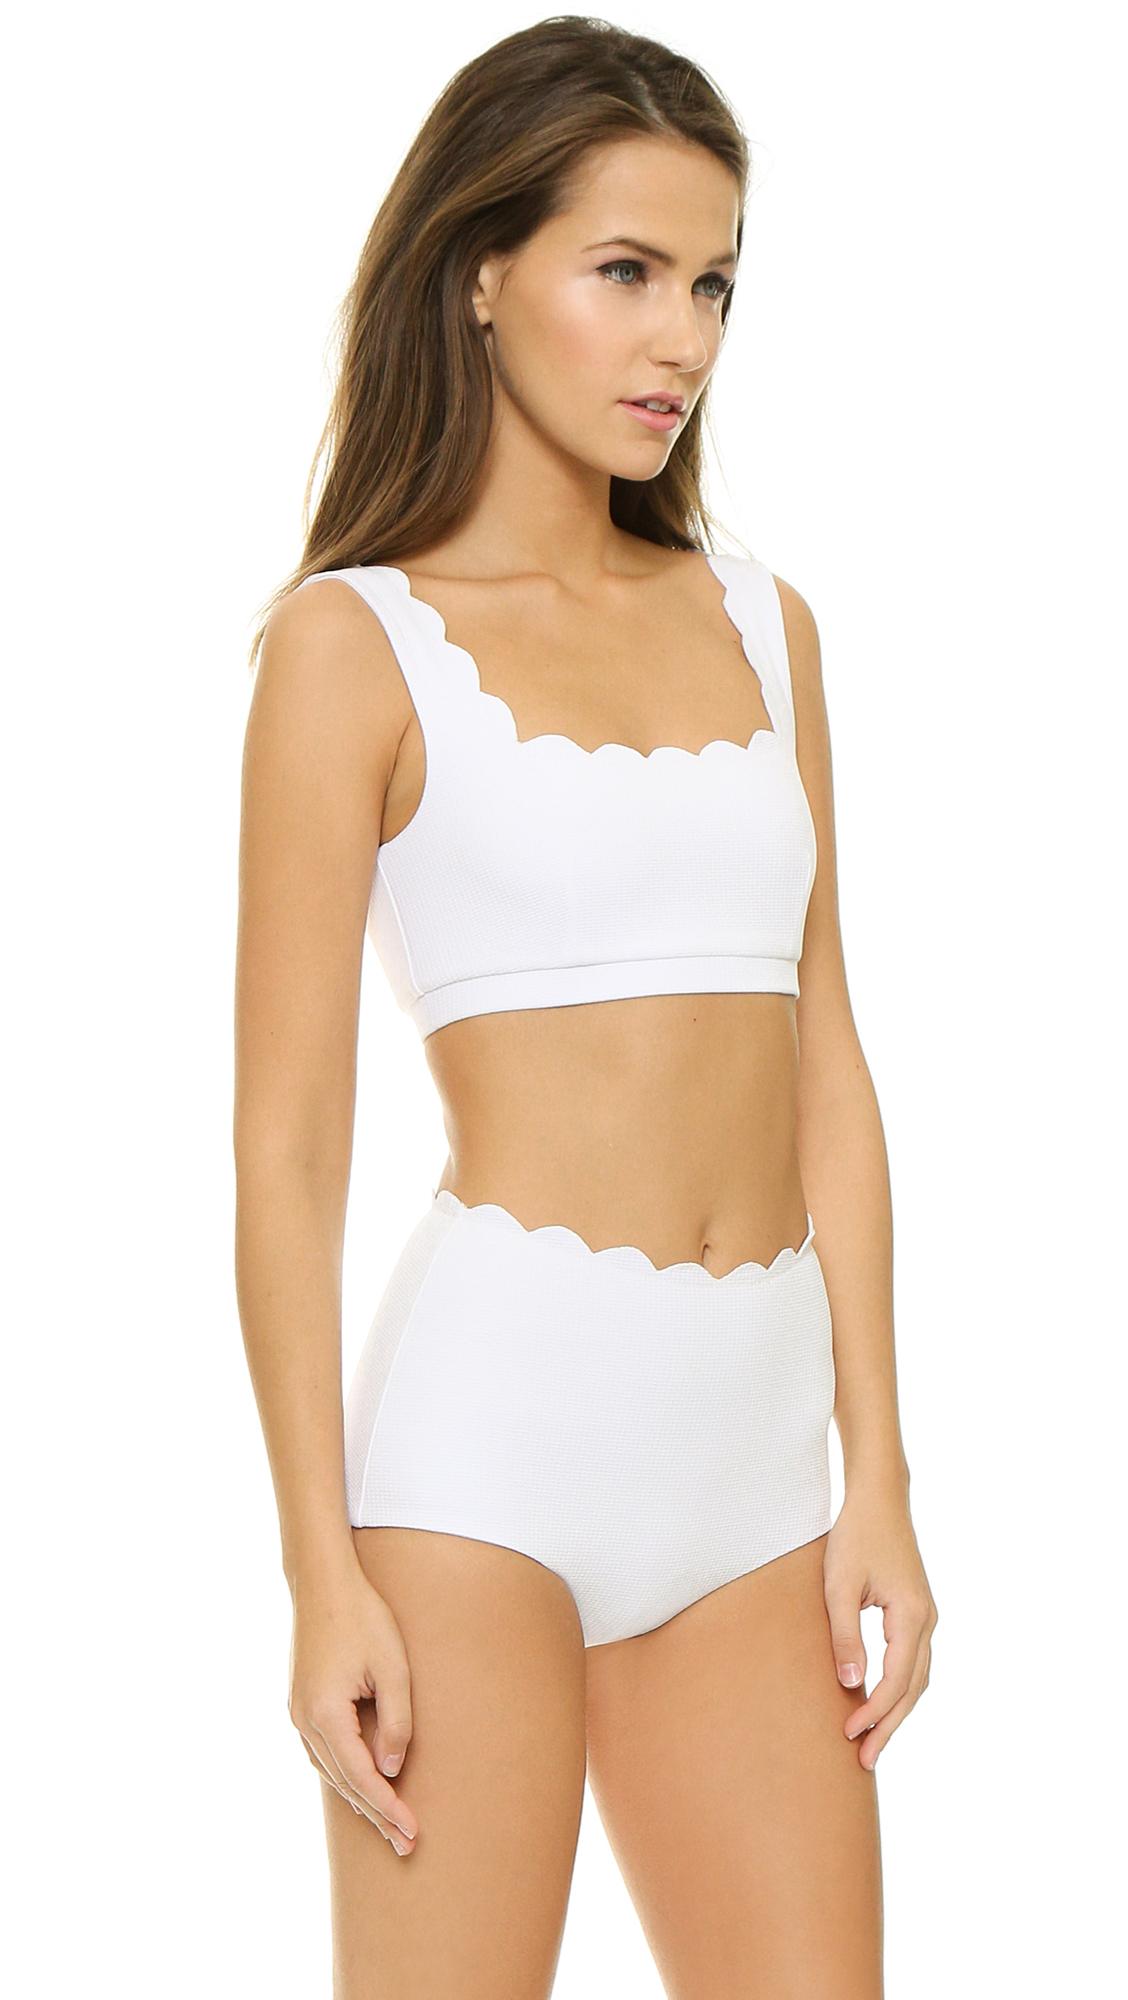 911646792ee Marysia Swim Palm Springs Sporty Bikini Top in White - Lyst